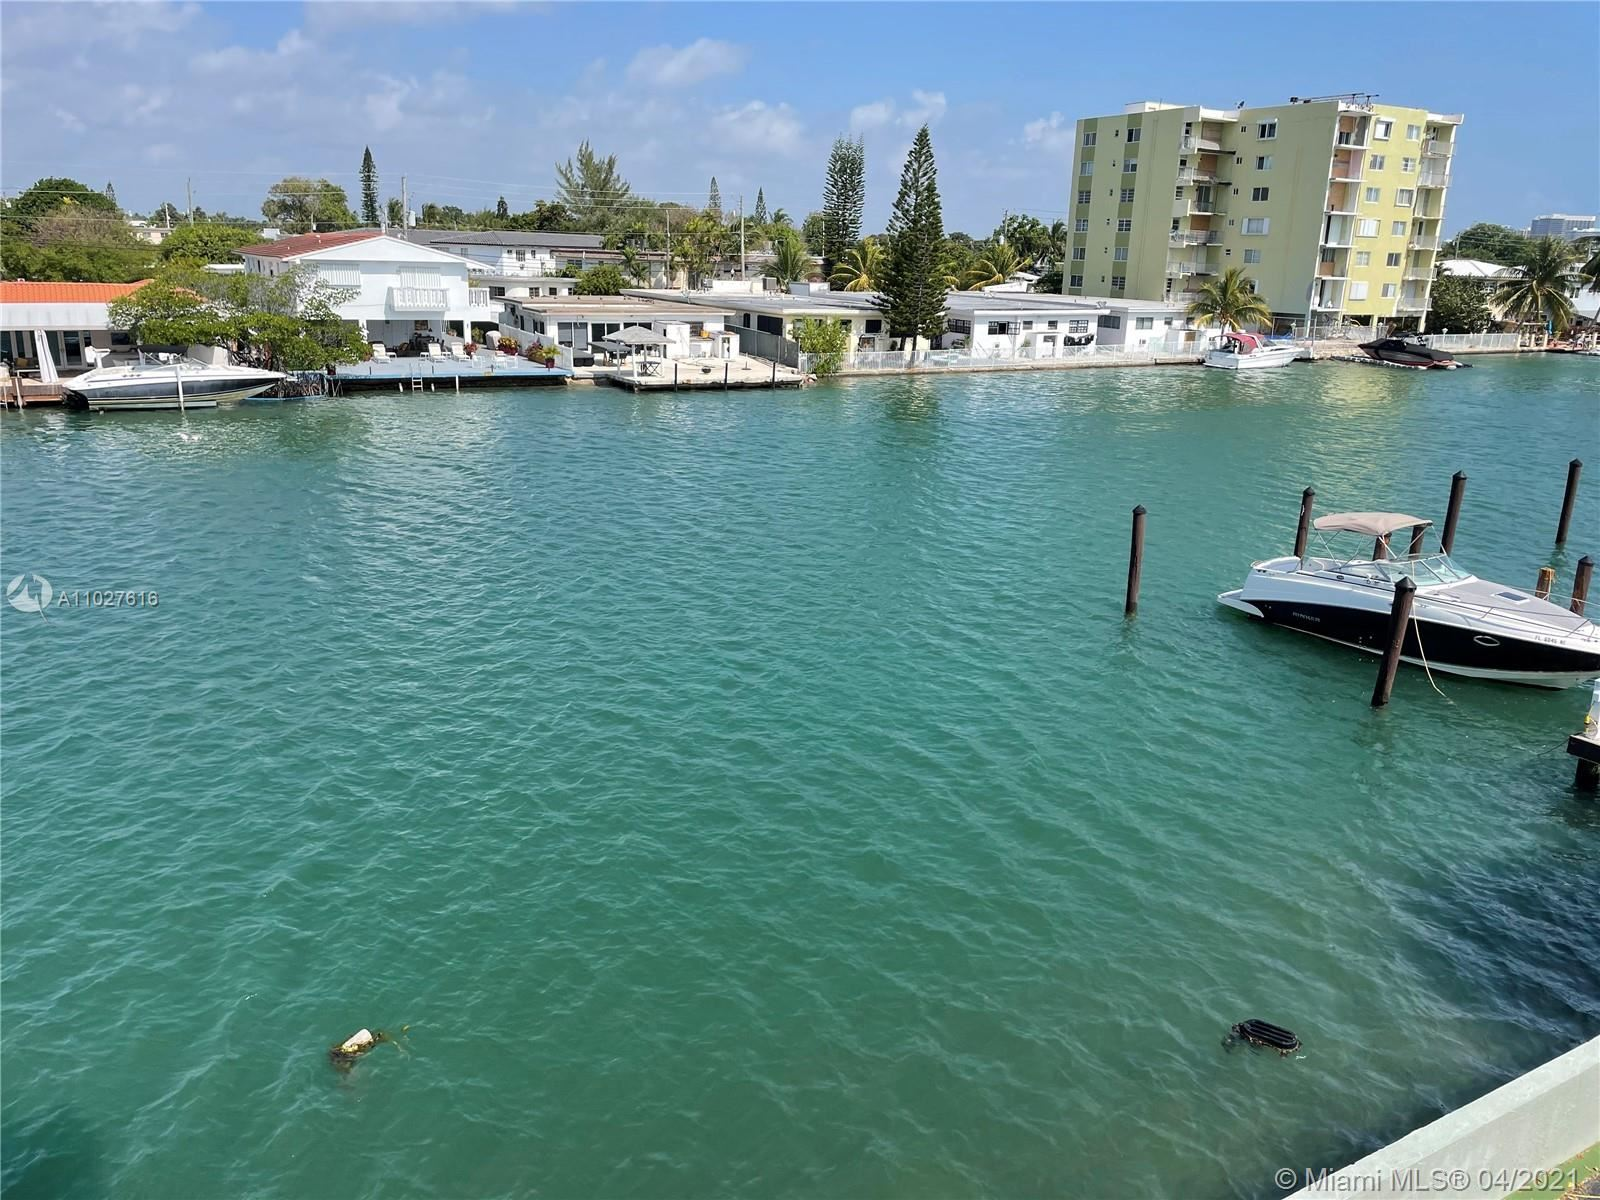 7900 Tatum Waterway Dr #312, Miami Beach, FL 33141 - #: A11027616